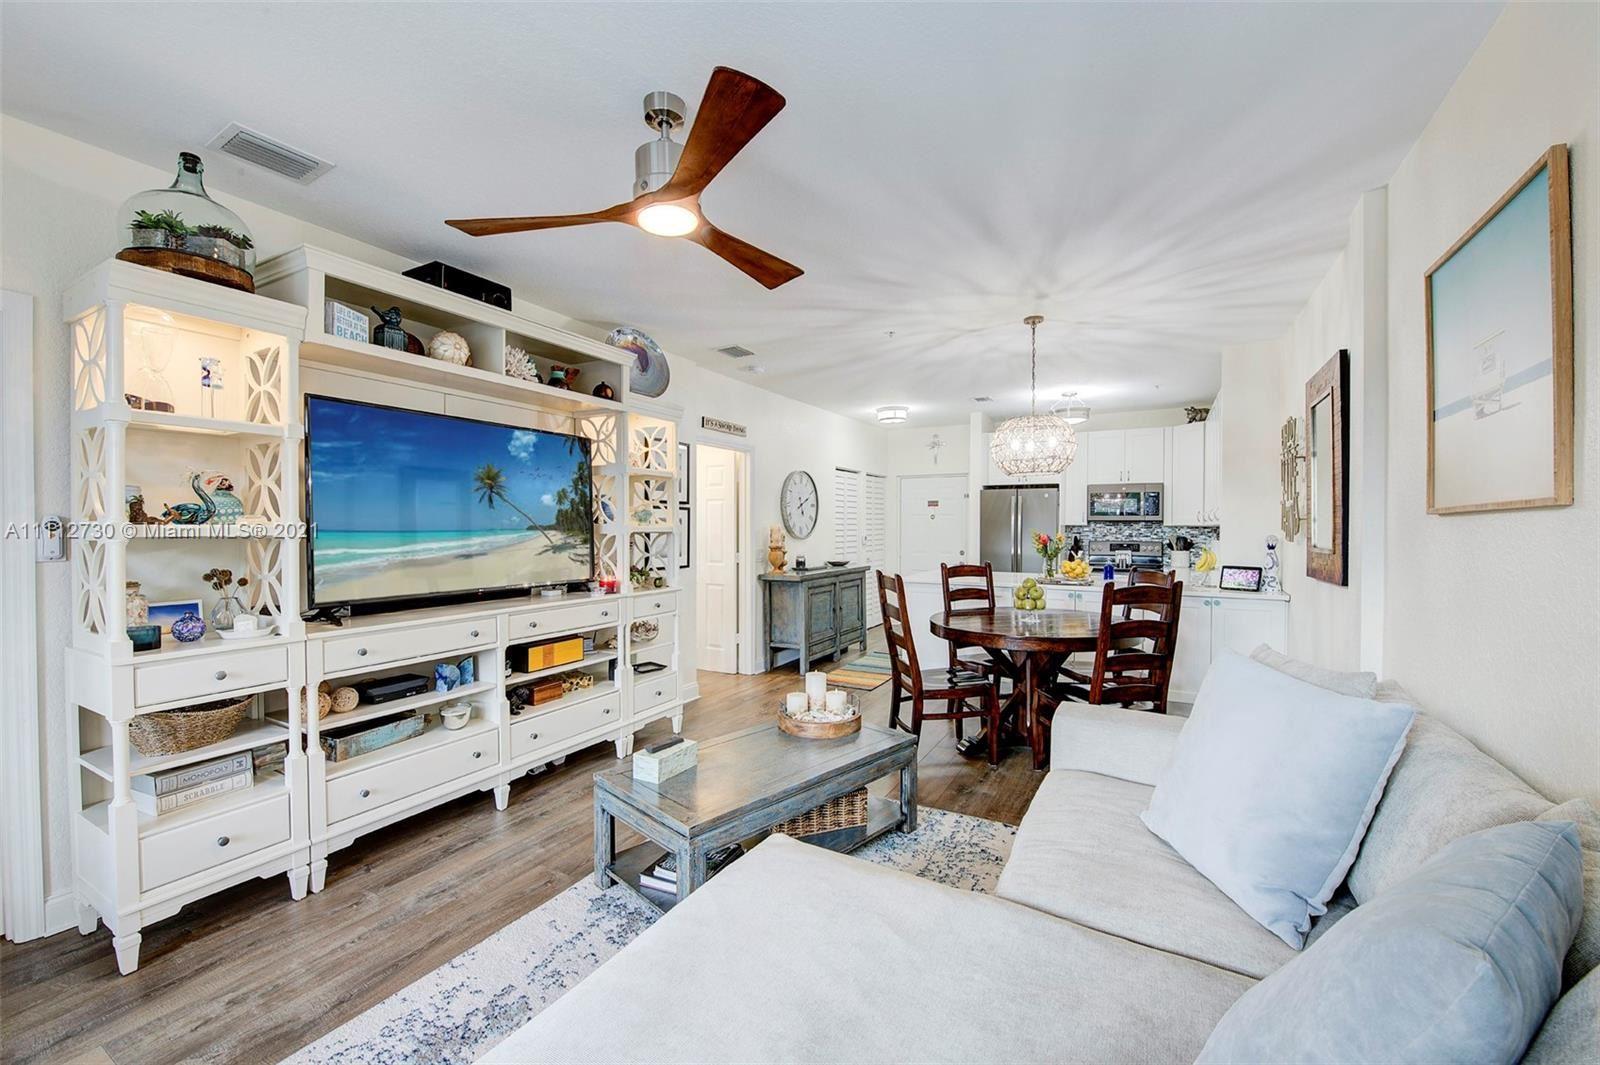 Photo of 75 Gulfstream Rd #214B, Dania Beach, FL 33004 (MLS # A11112730)